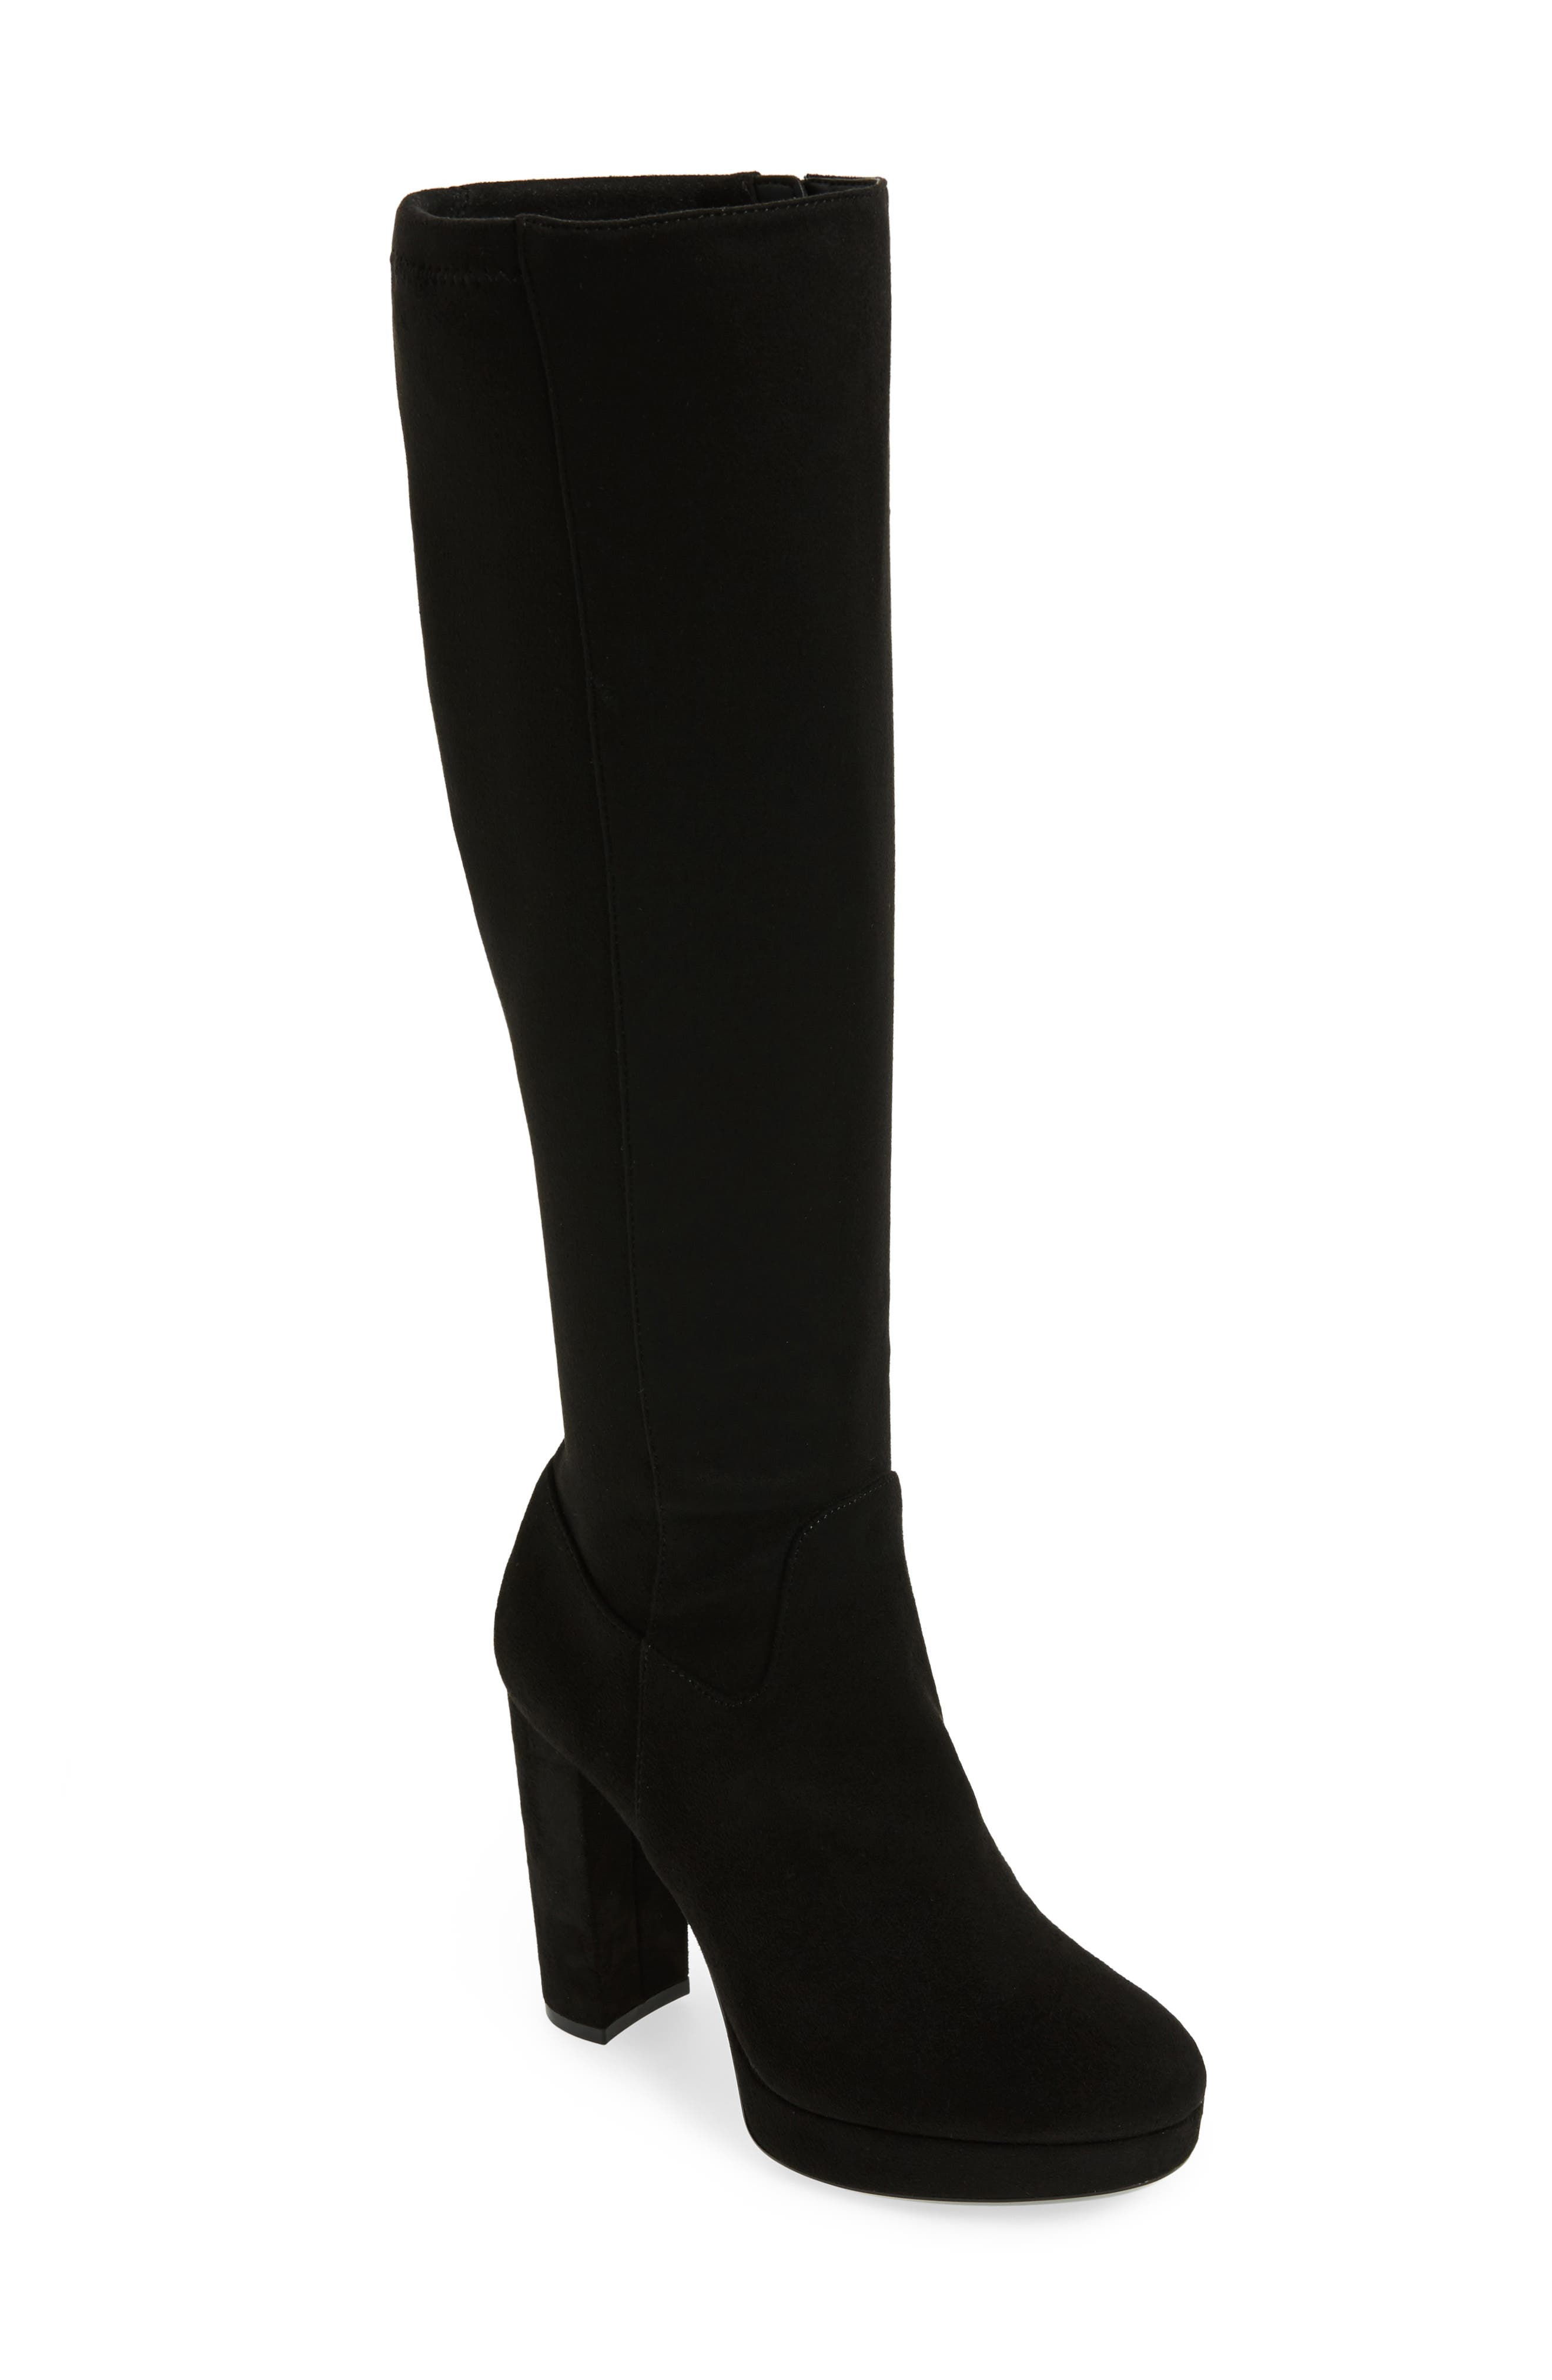 Main Image - Calvin Klein Mailia Tall Boot (Women)